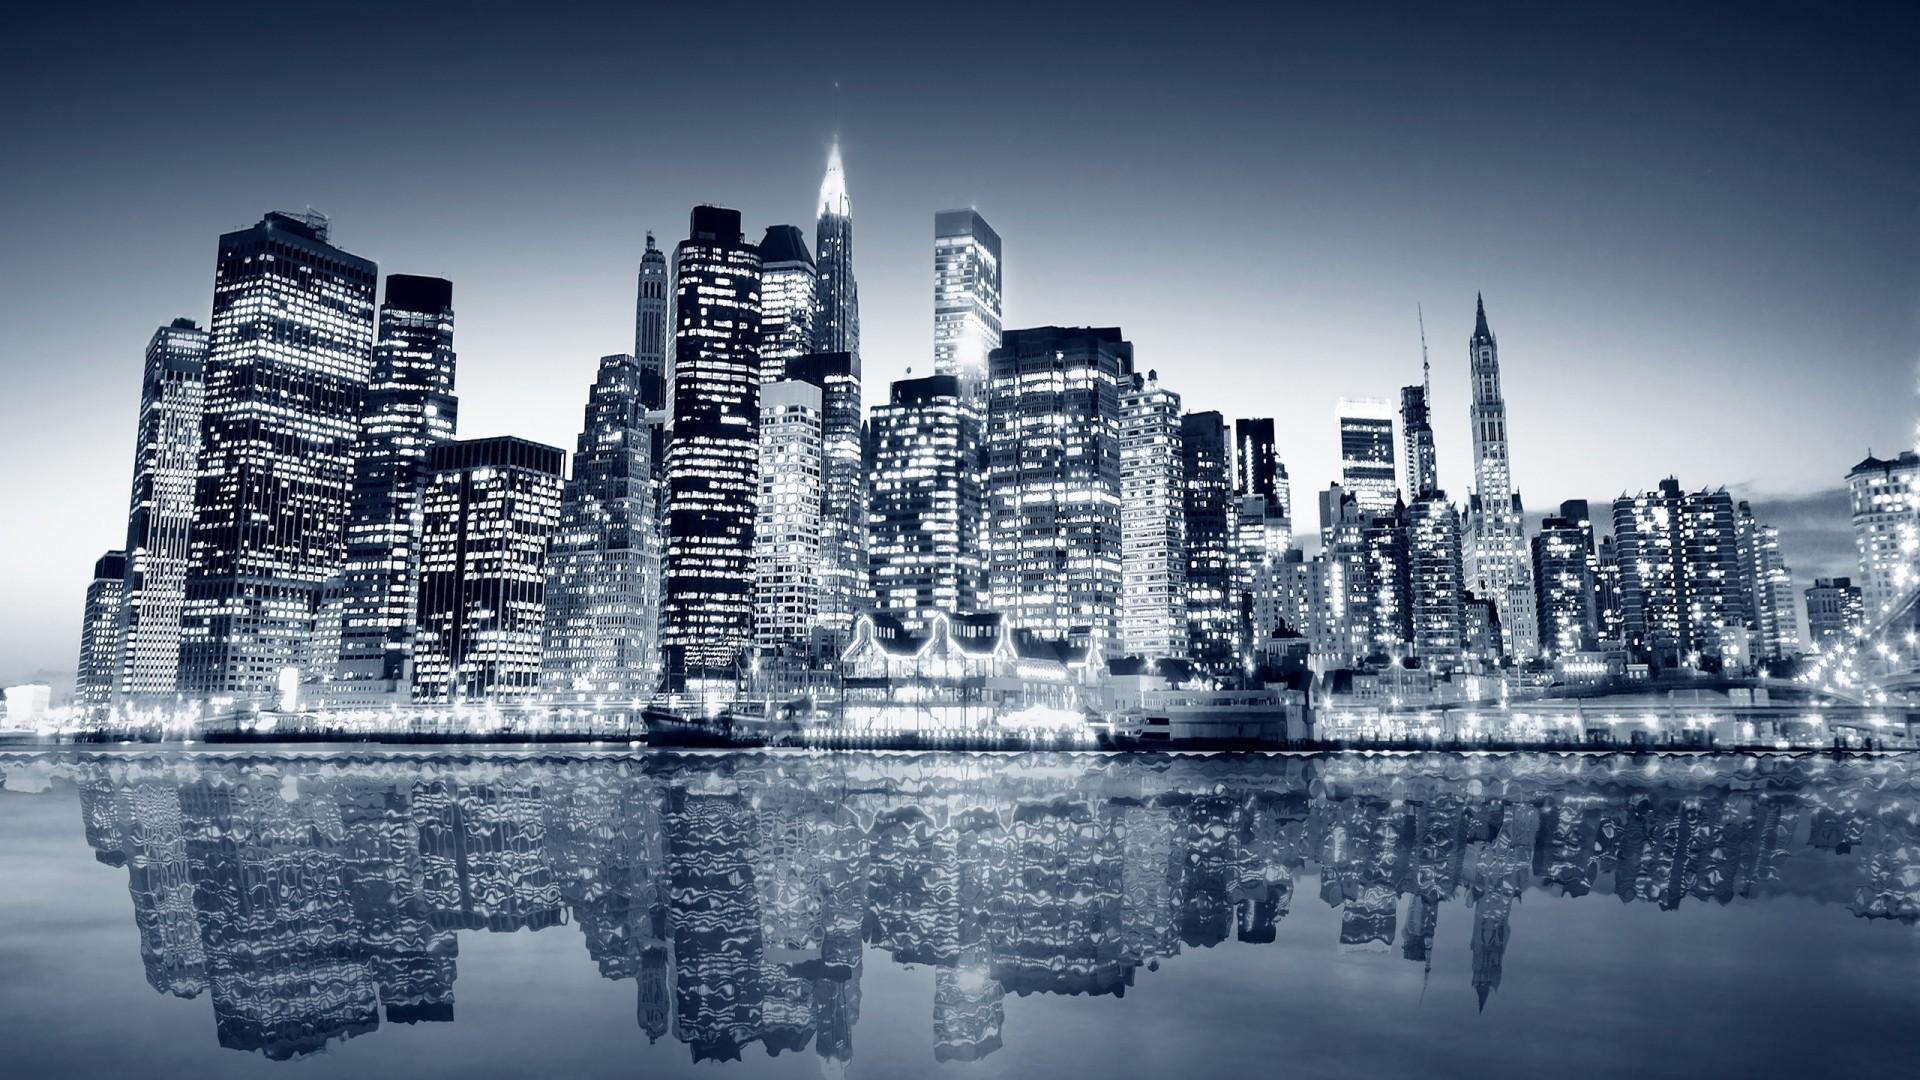 New york city hd wallpaper wallpapersafari - New york city wallpaper hd pictures ...